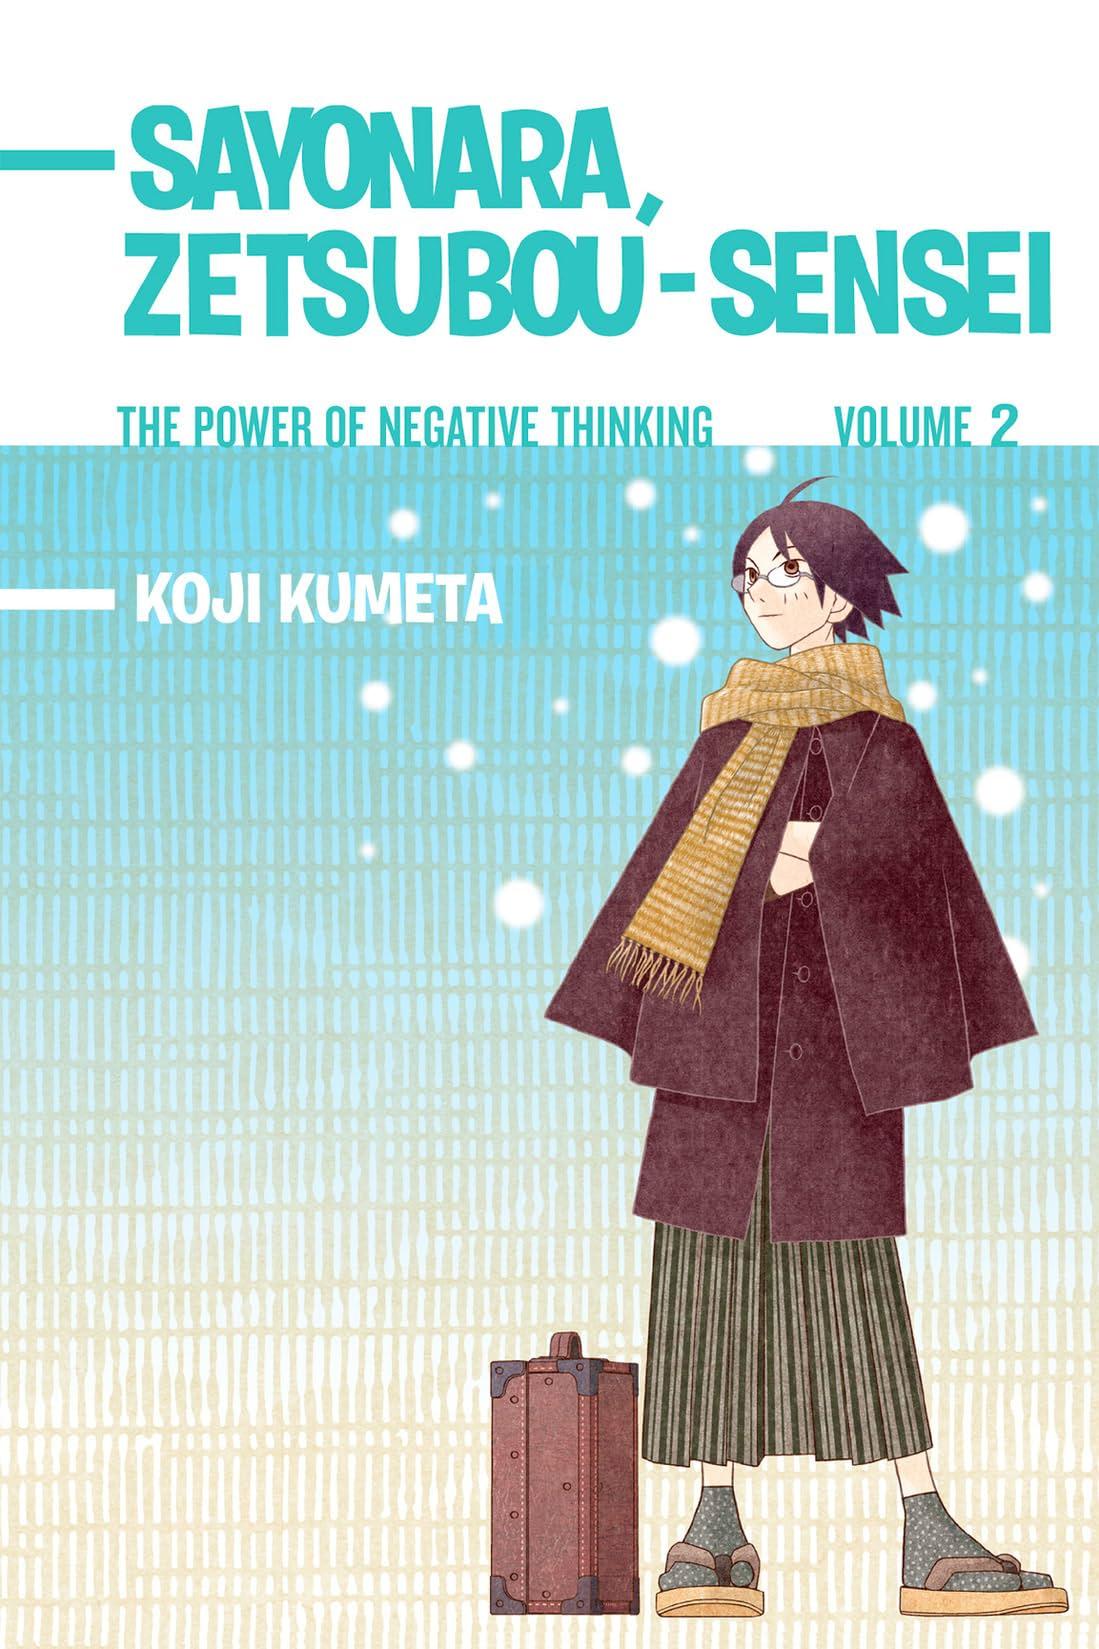 Sayonara Zetsubou-Sensei Vol. 2